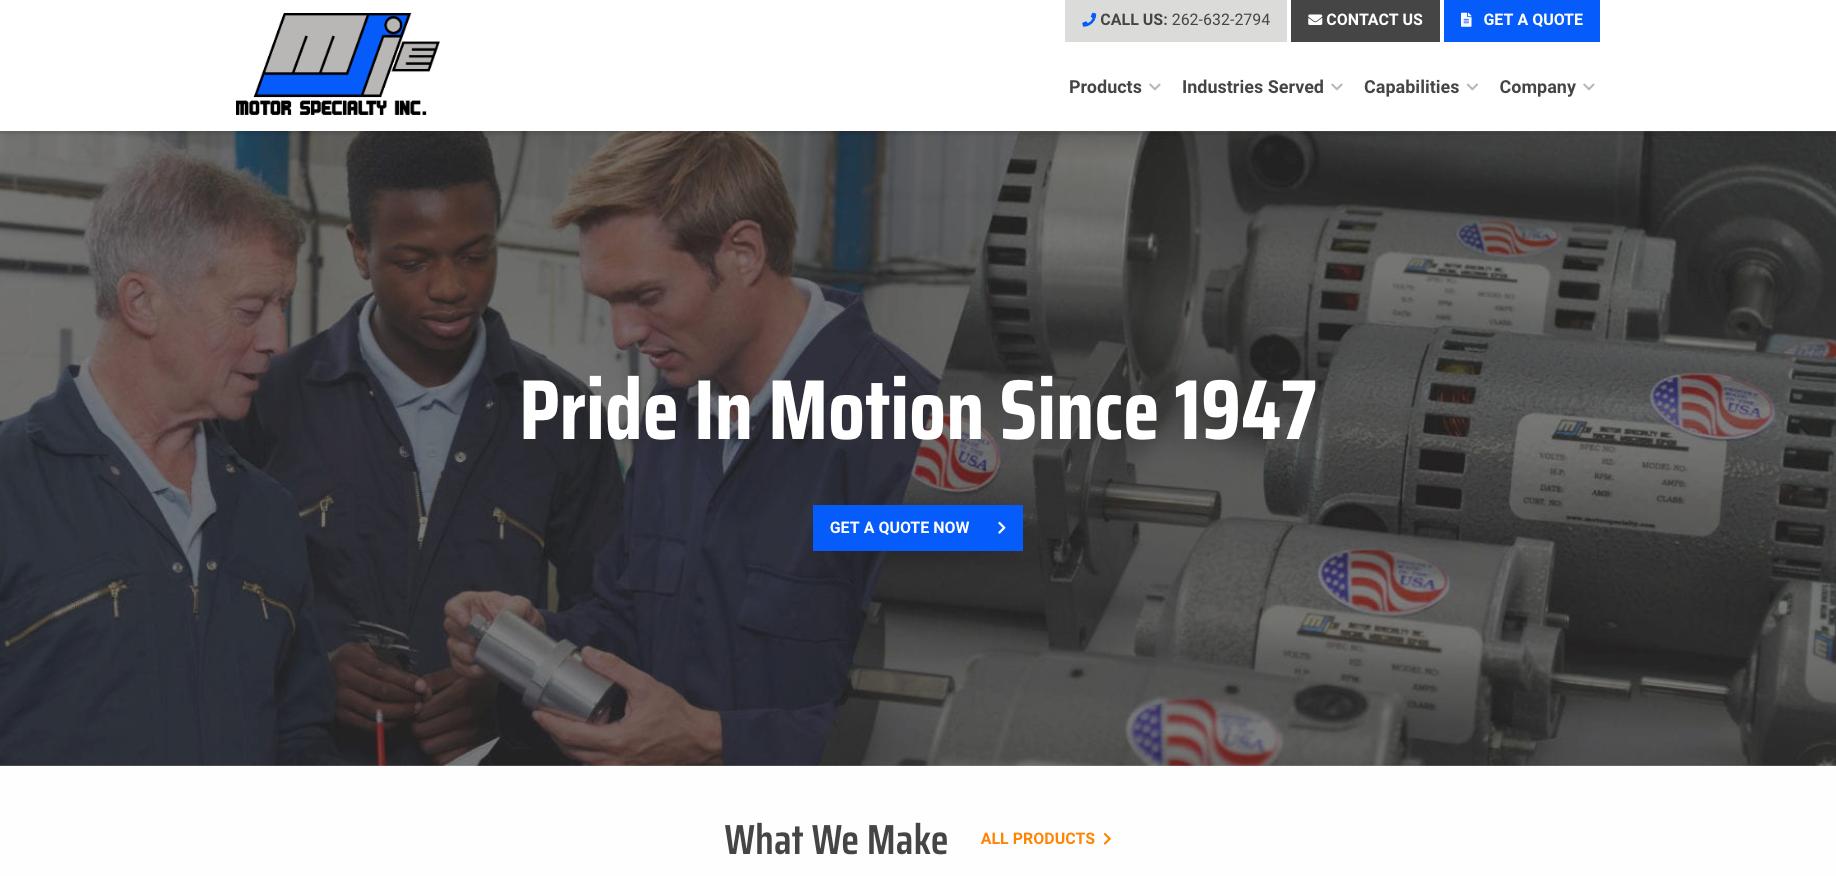 Motor Specialty Homepage